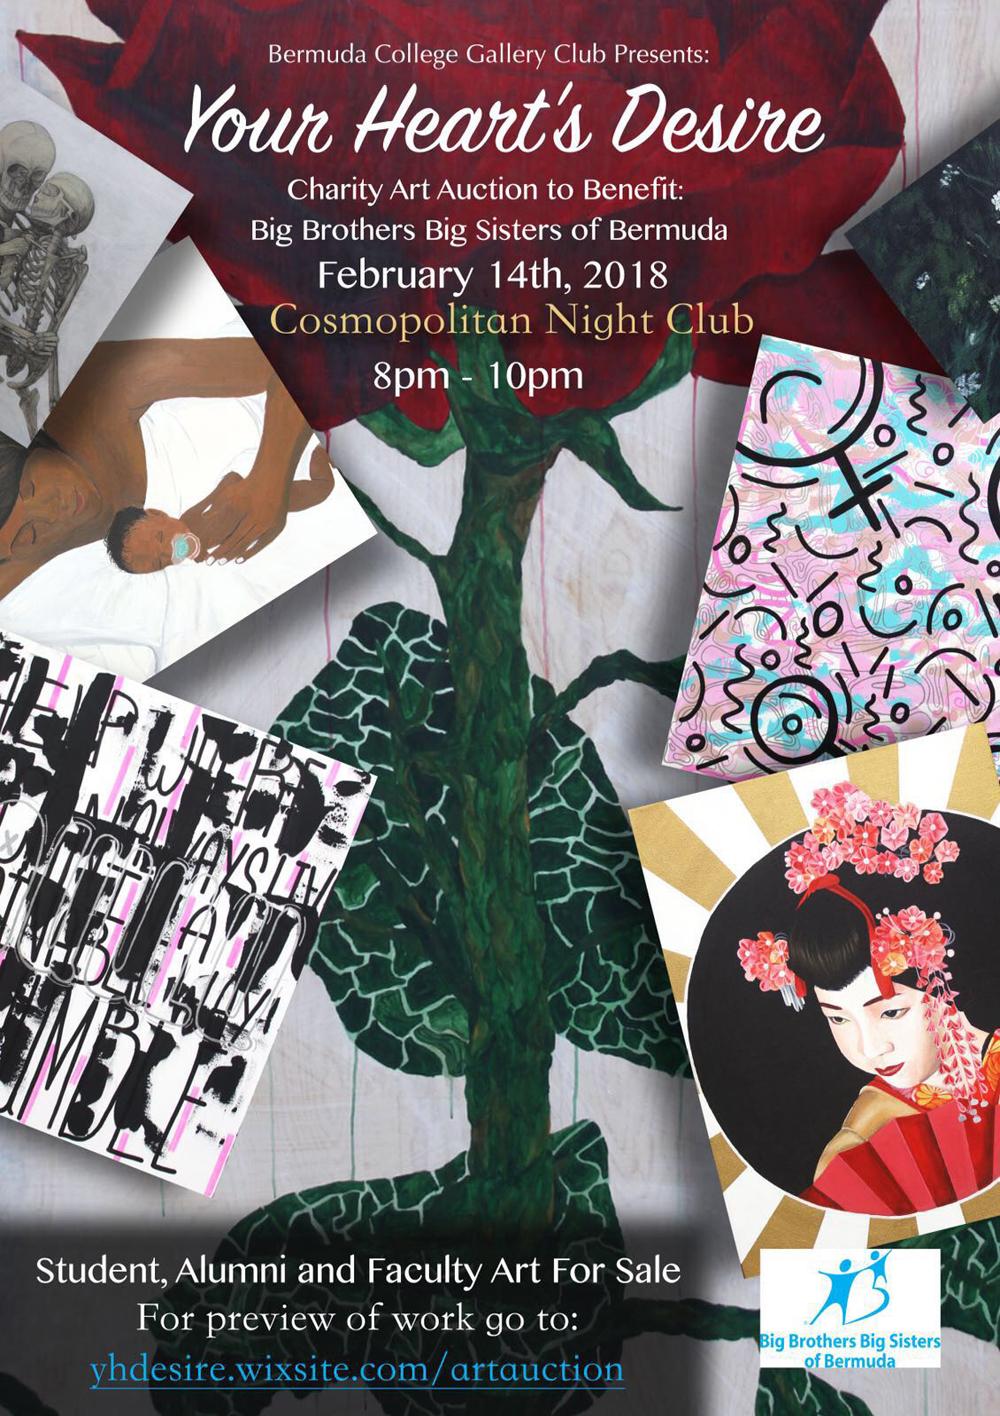 Bermuda College Gallery Club Art Auction Feb 12 2018